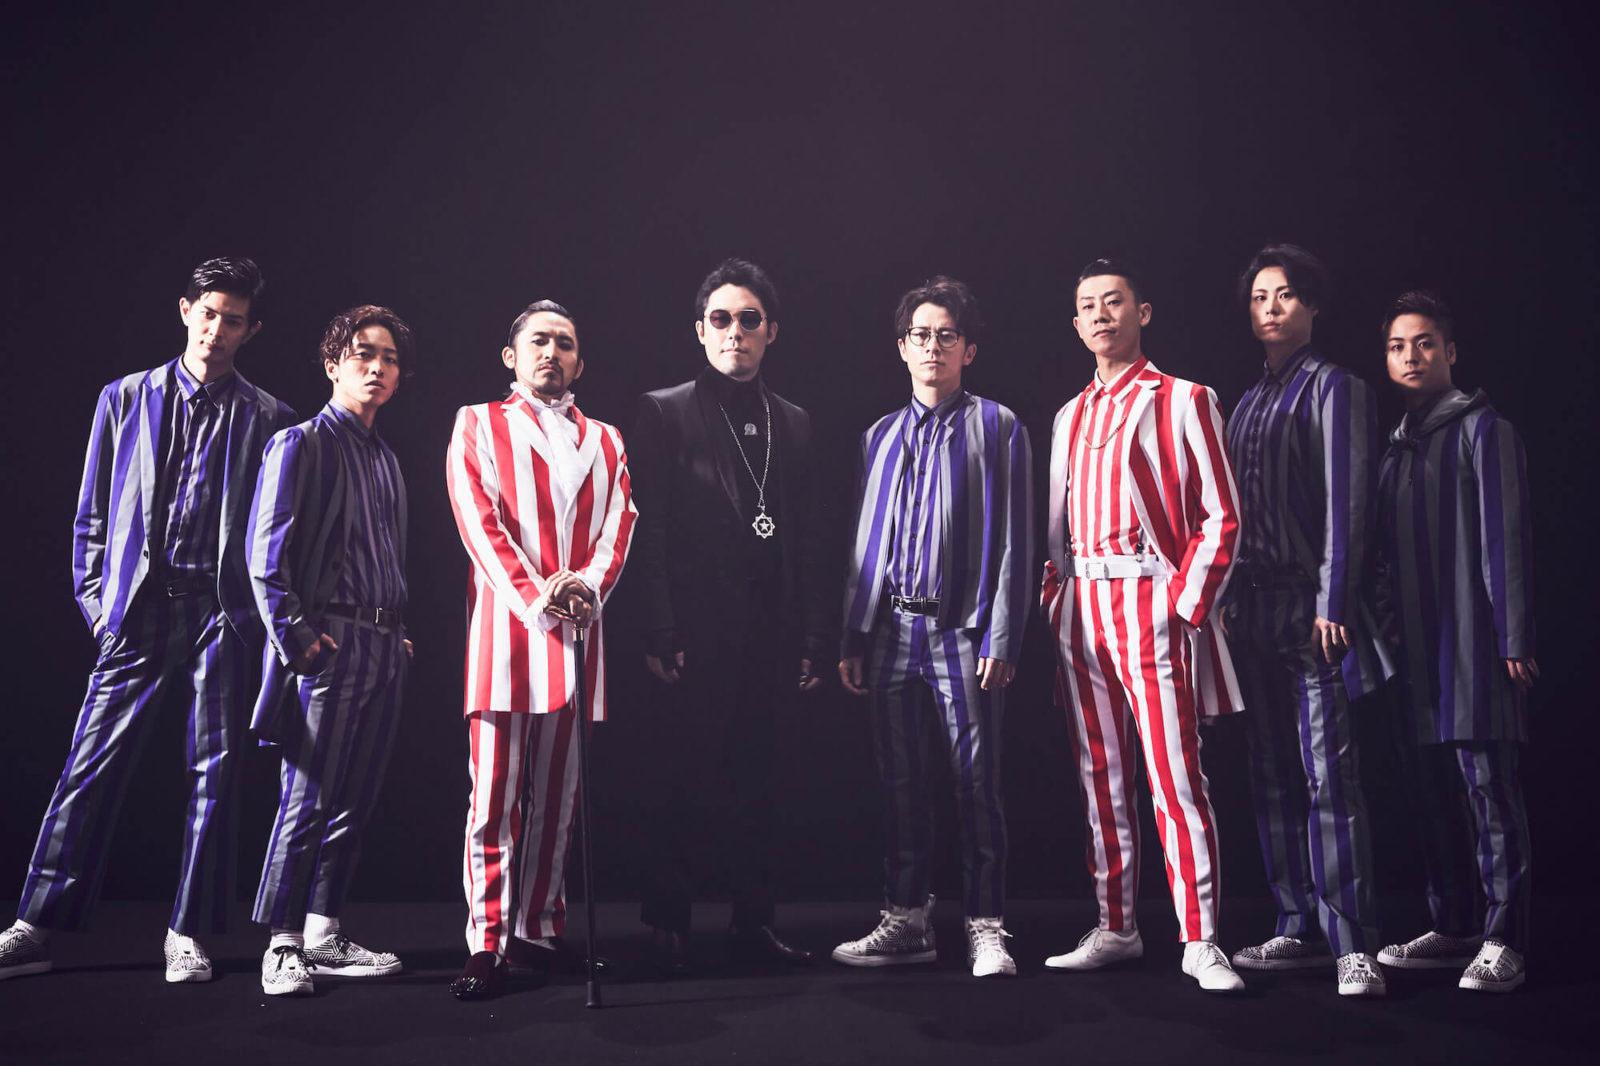 C&K ニューアルバム『TEN』収録曲「GORIN with RADIO FISH」ミュージックビデオ公開サムネイル画像